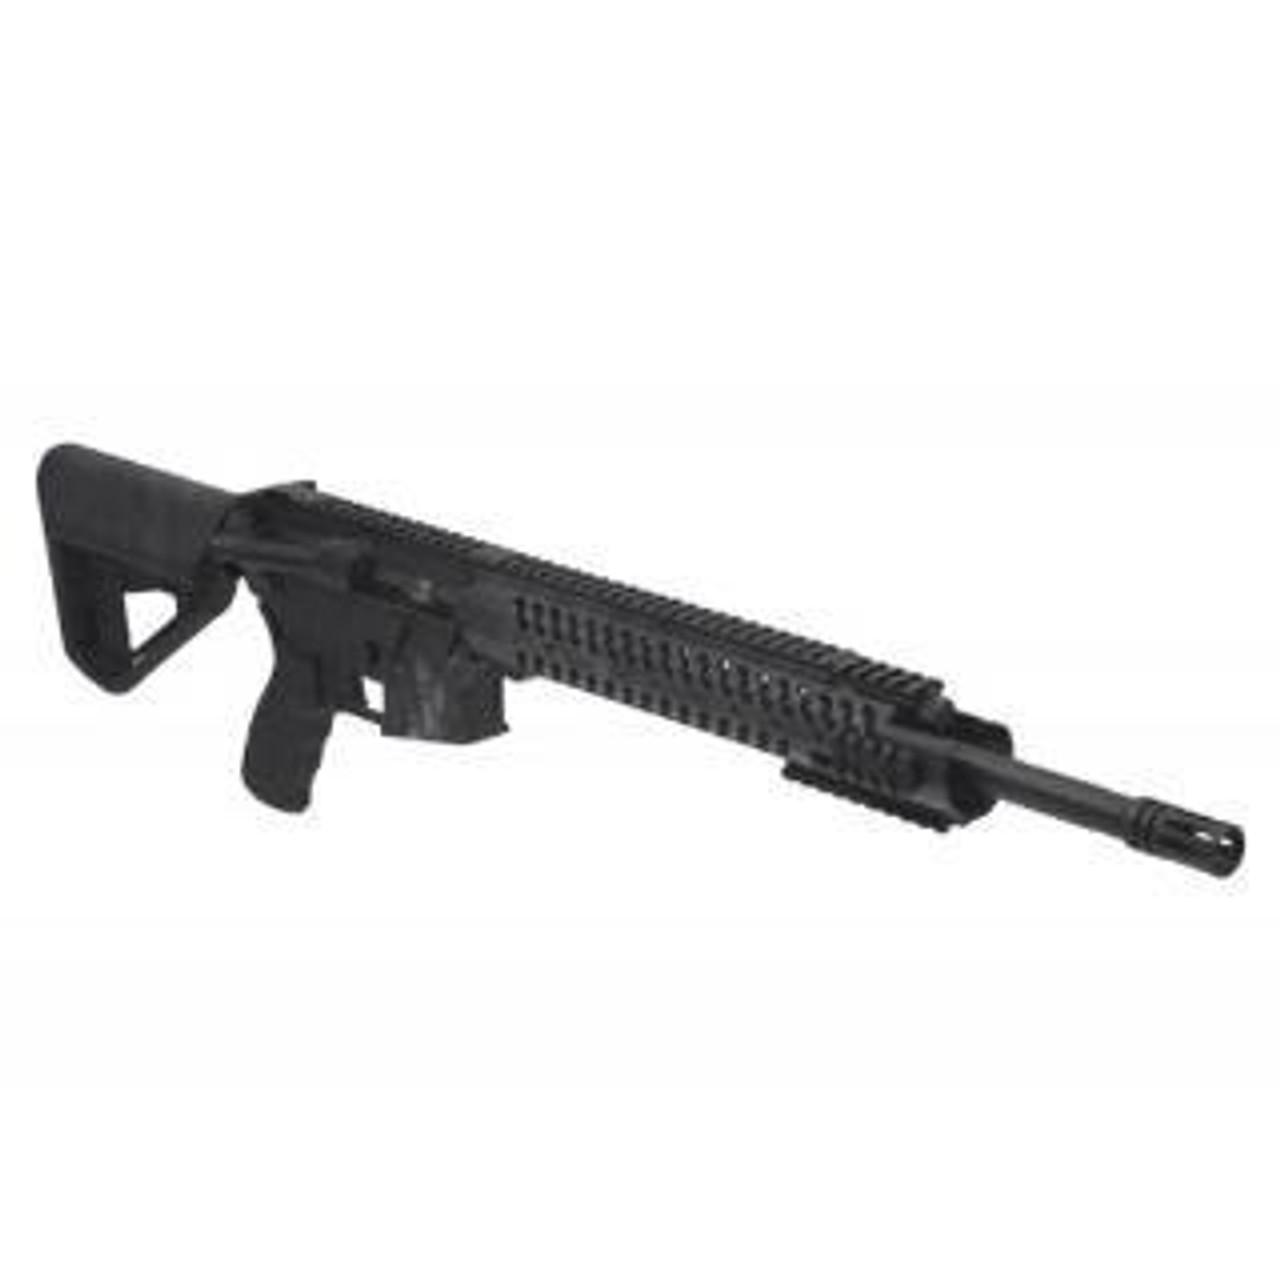 Adams Arms Mid Tactical Evo XLP CALIFORNIA LEGAL - .223/5.56